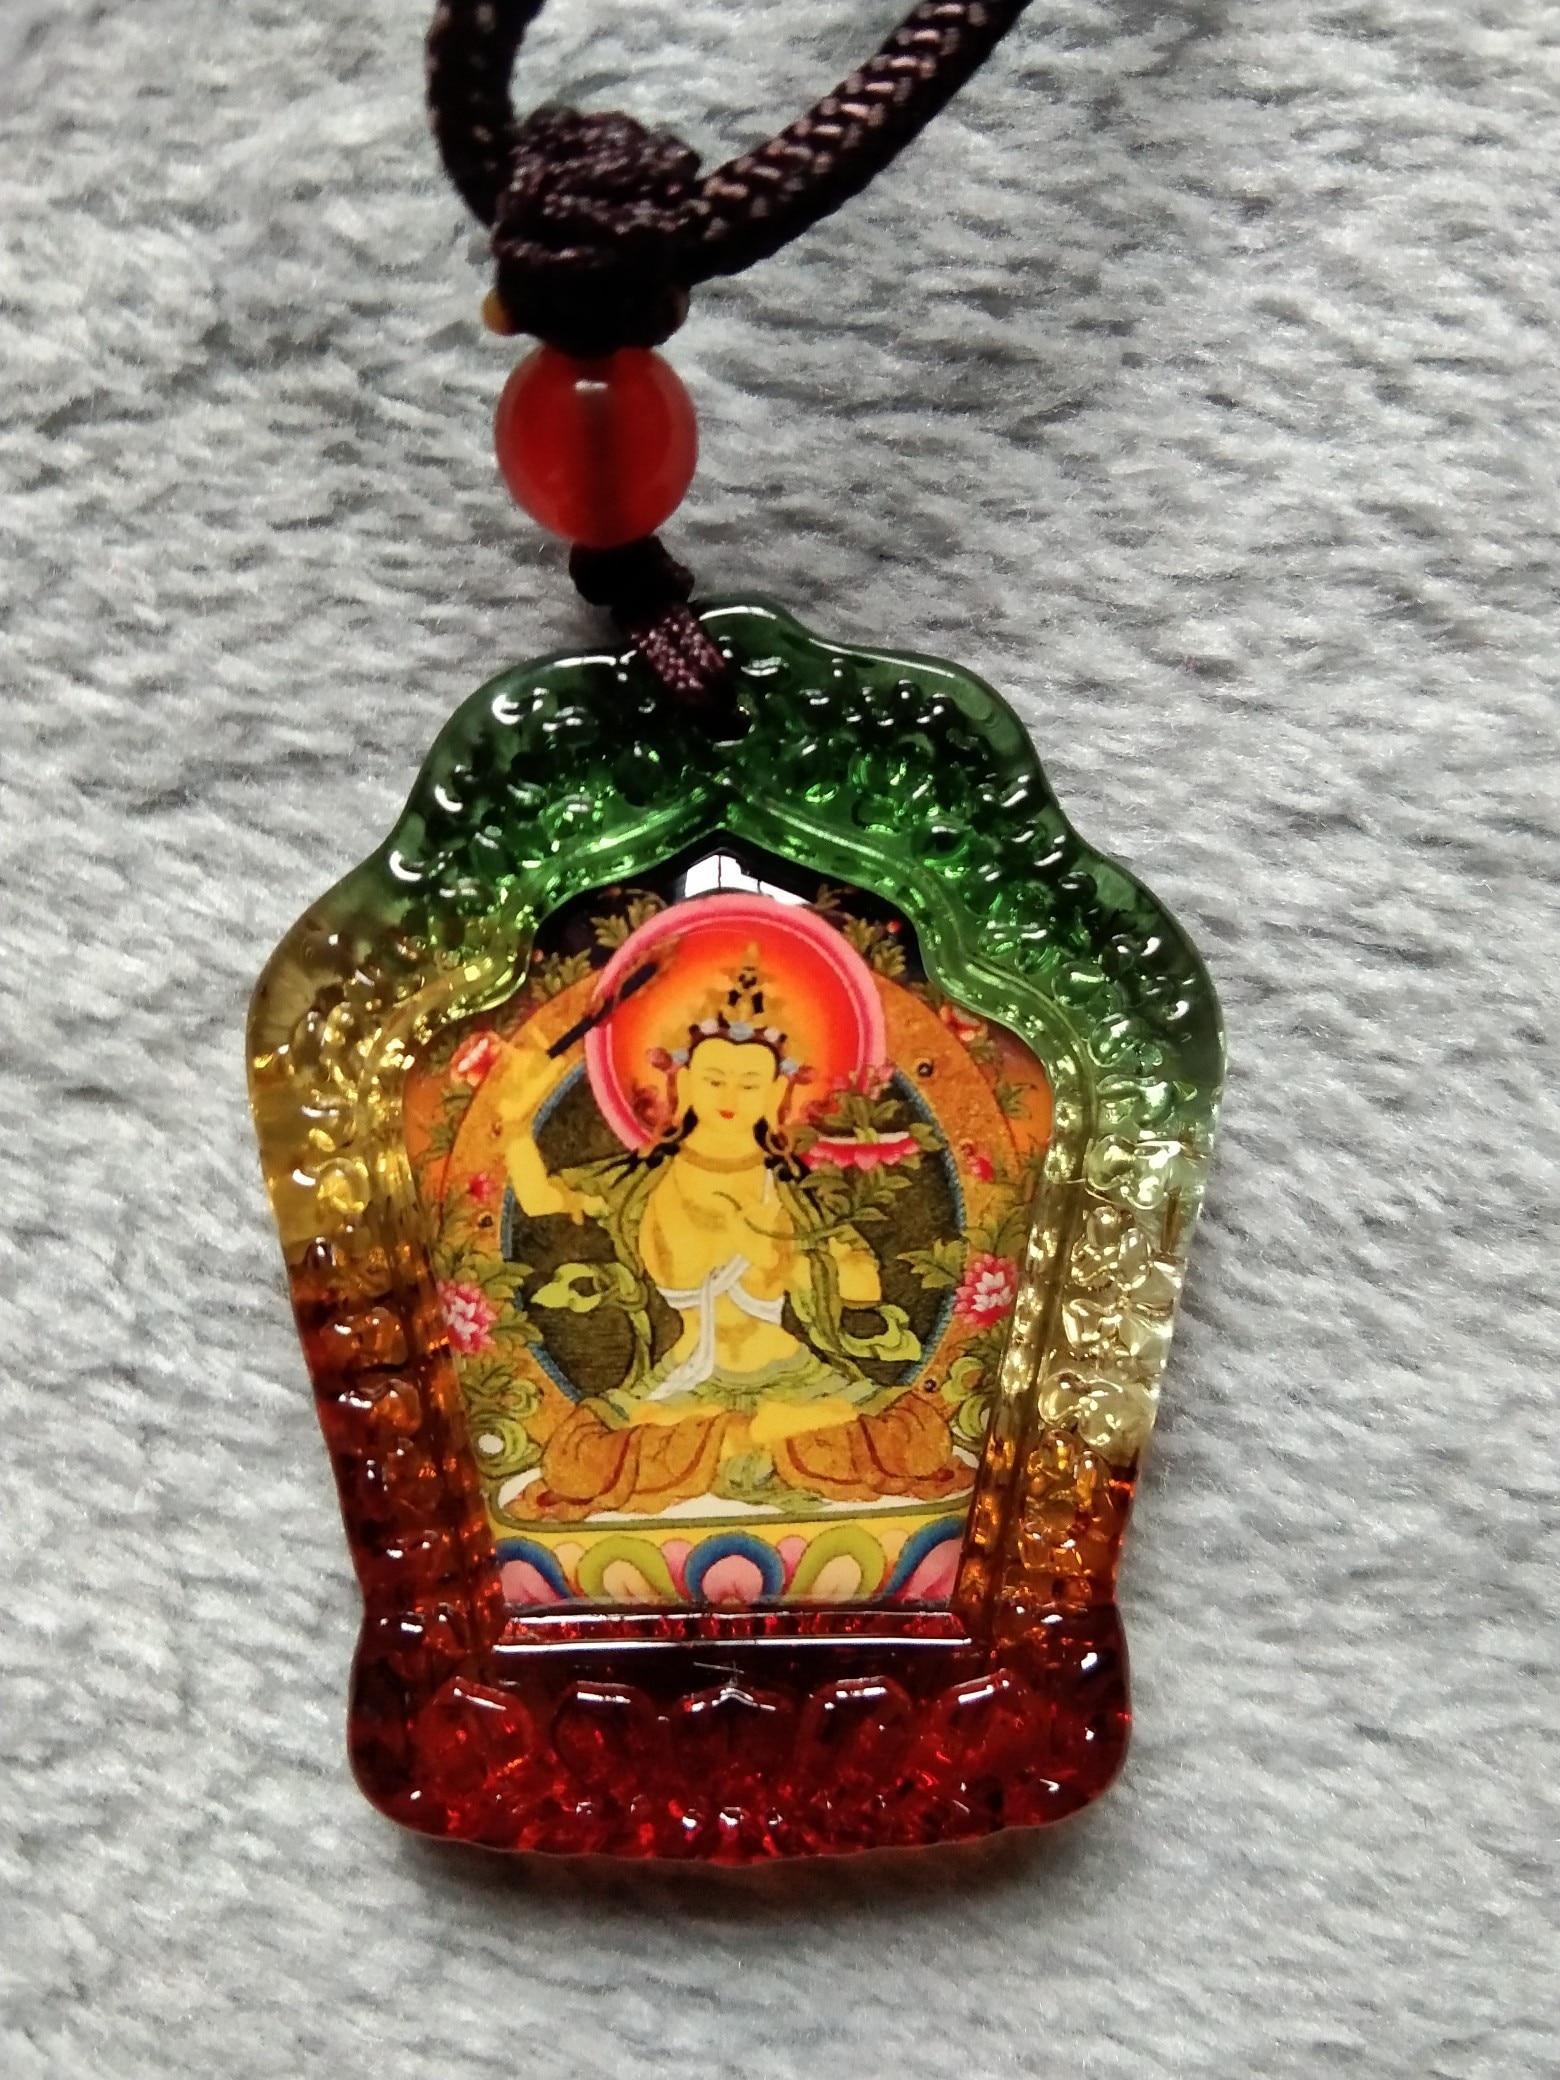 GOOD Buddhist Amulet Greco-Buddhist Pocket Travel Efficacious Mascot Auspicious The Bodhisattva Manjusri Buddha Crystal Pendant